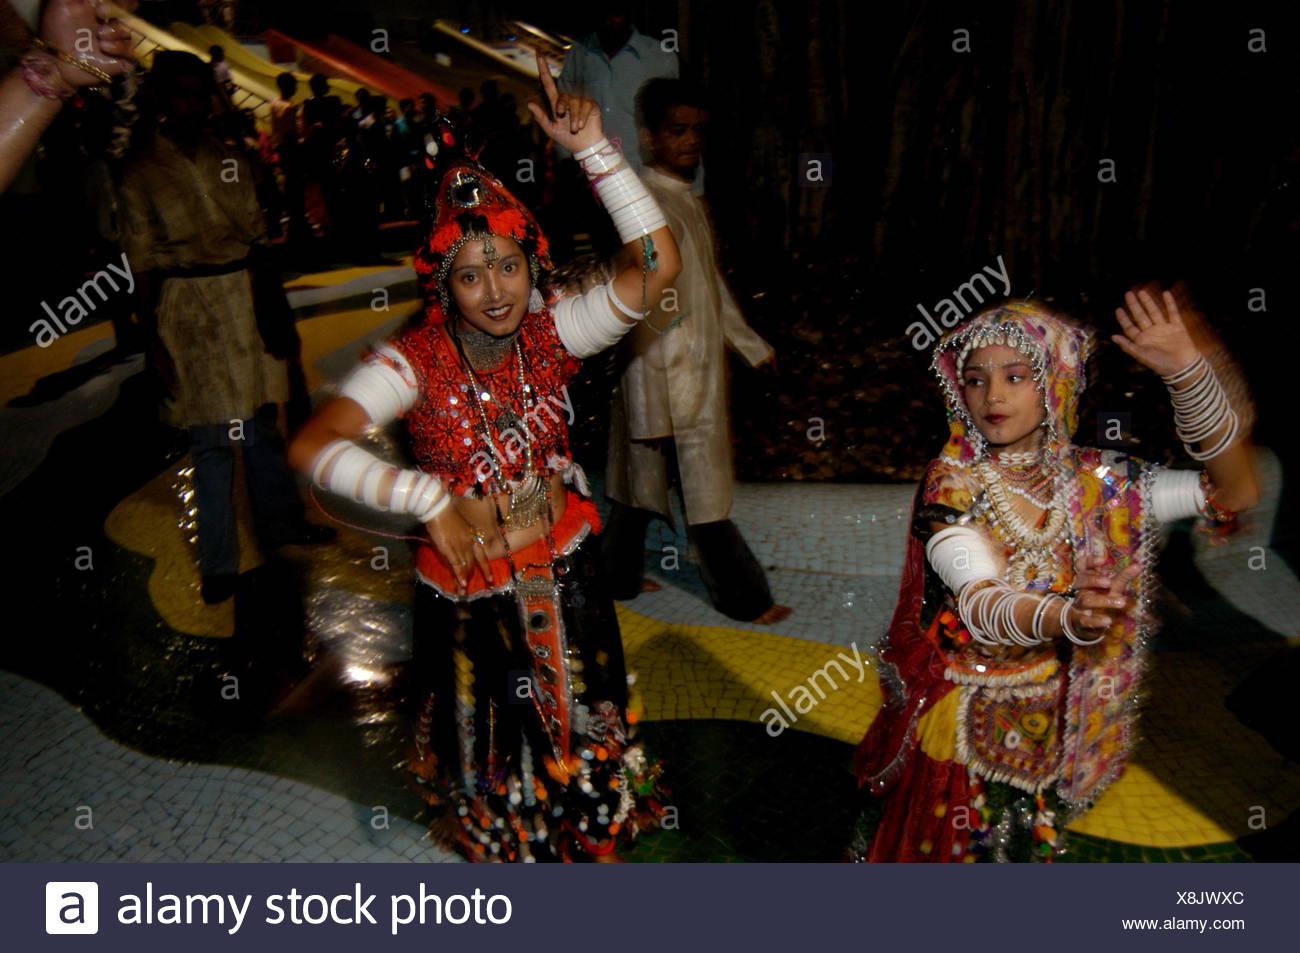 Artistes performing the Garba - Stock Image